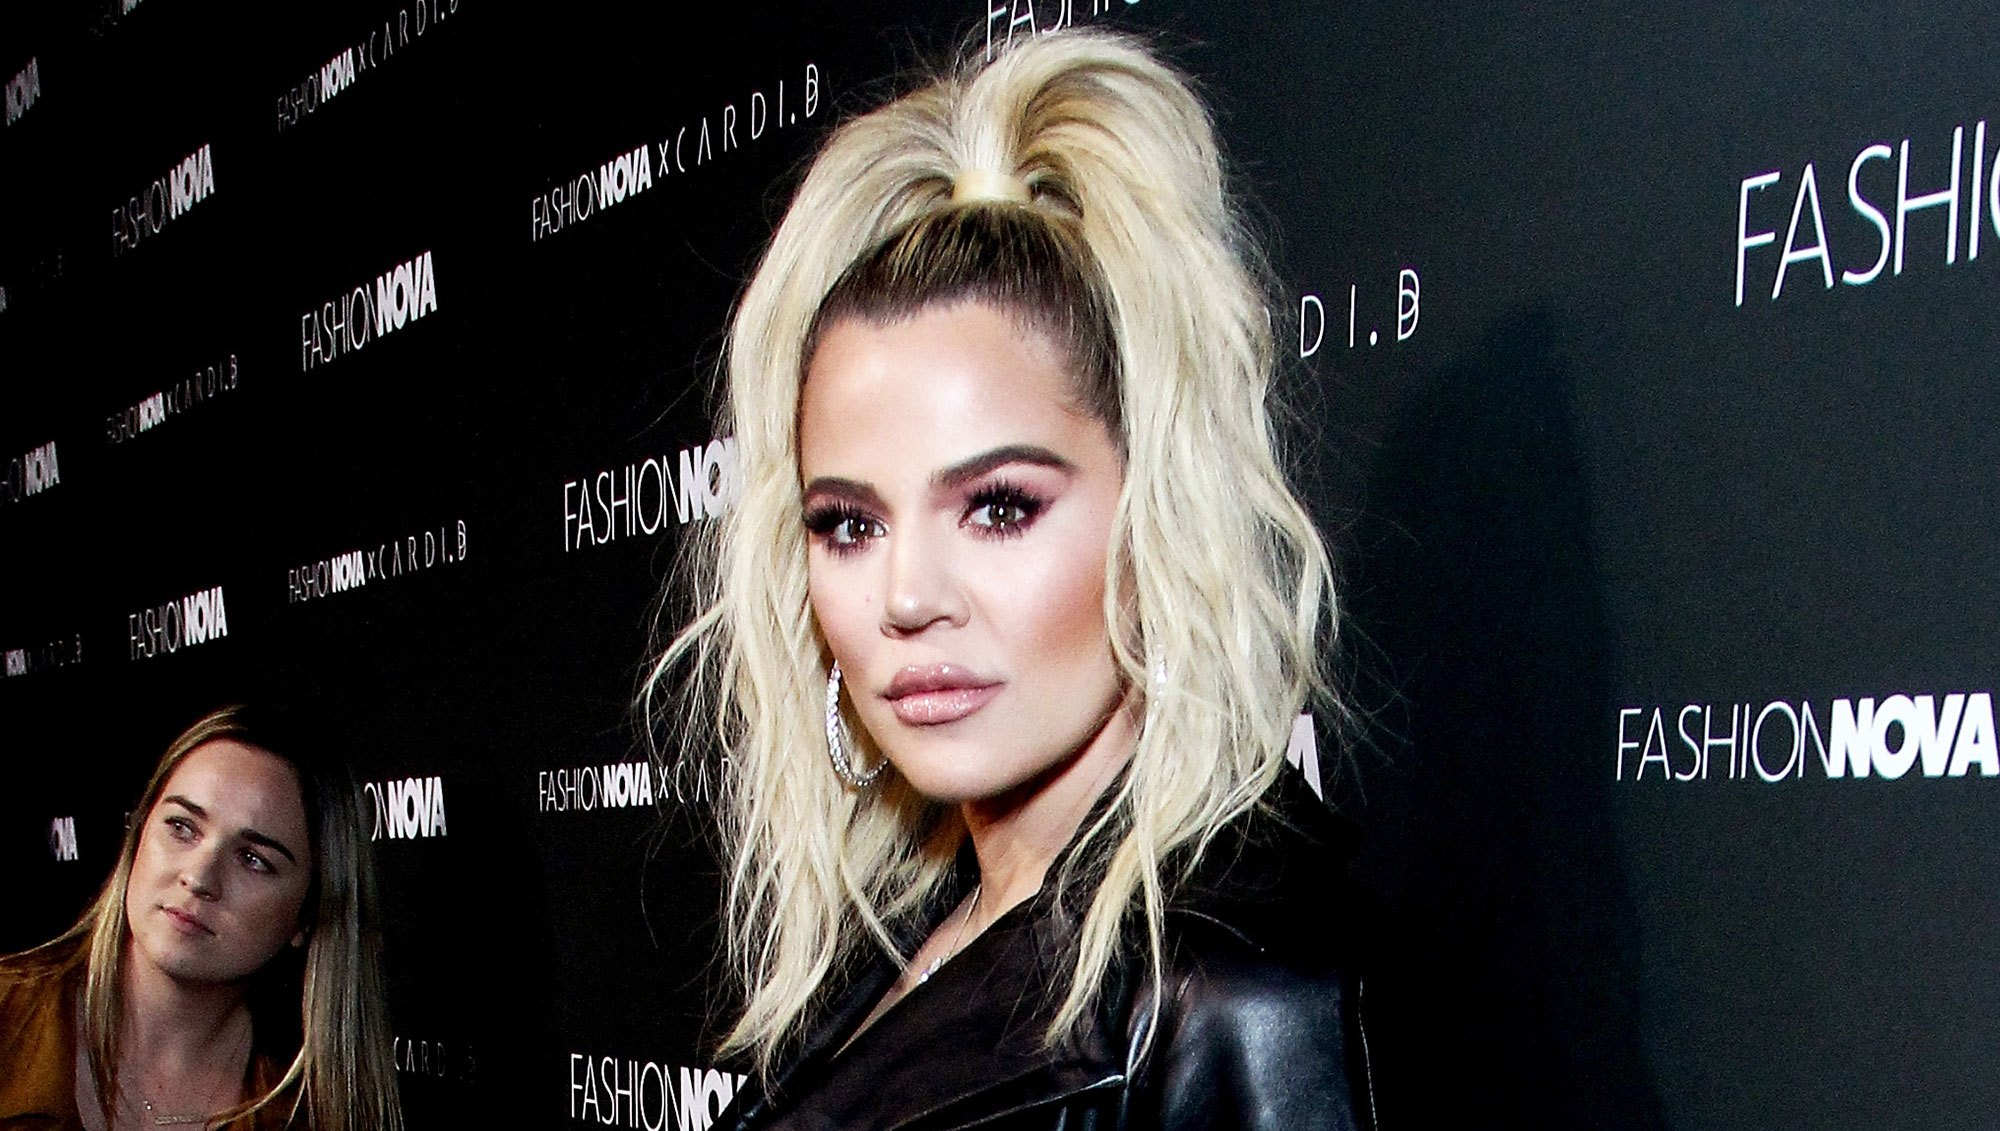 Khloe Kardashian Khloe Kardashian Posts Cryptic Message on Instagram: 'You Just Took a Major Loss'